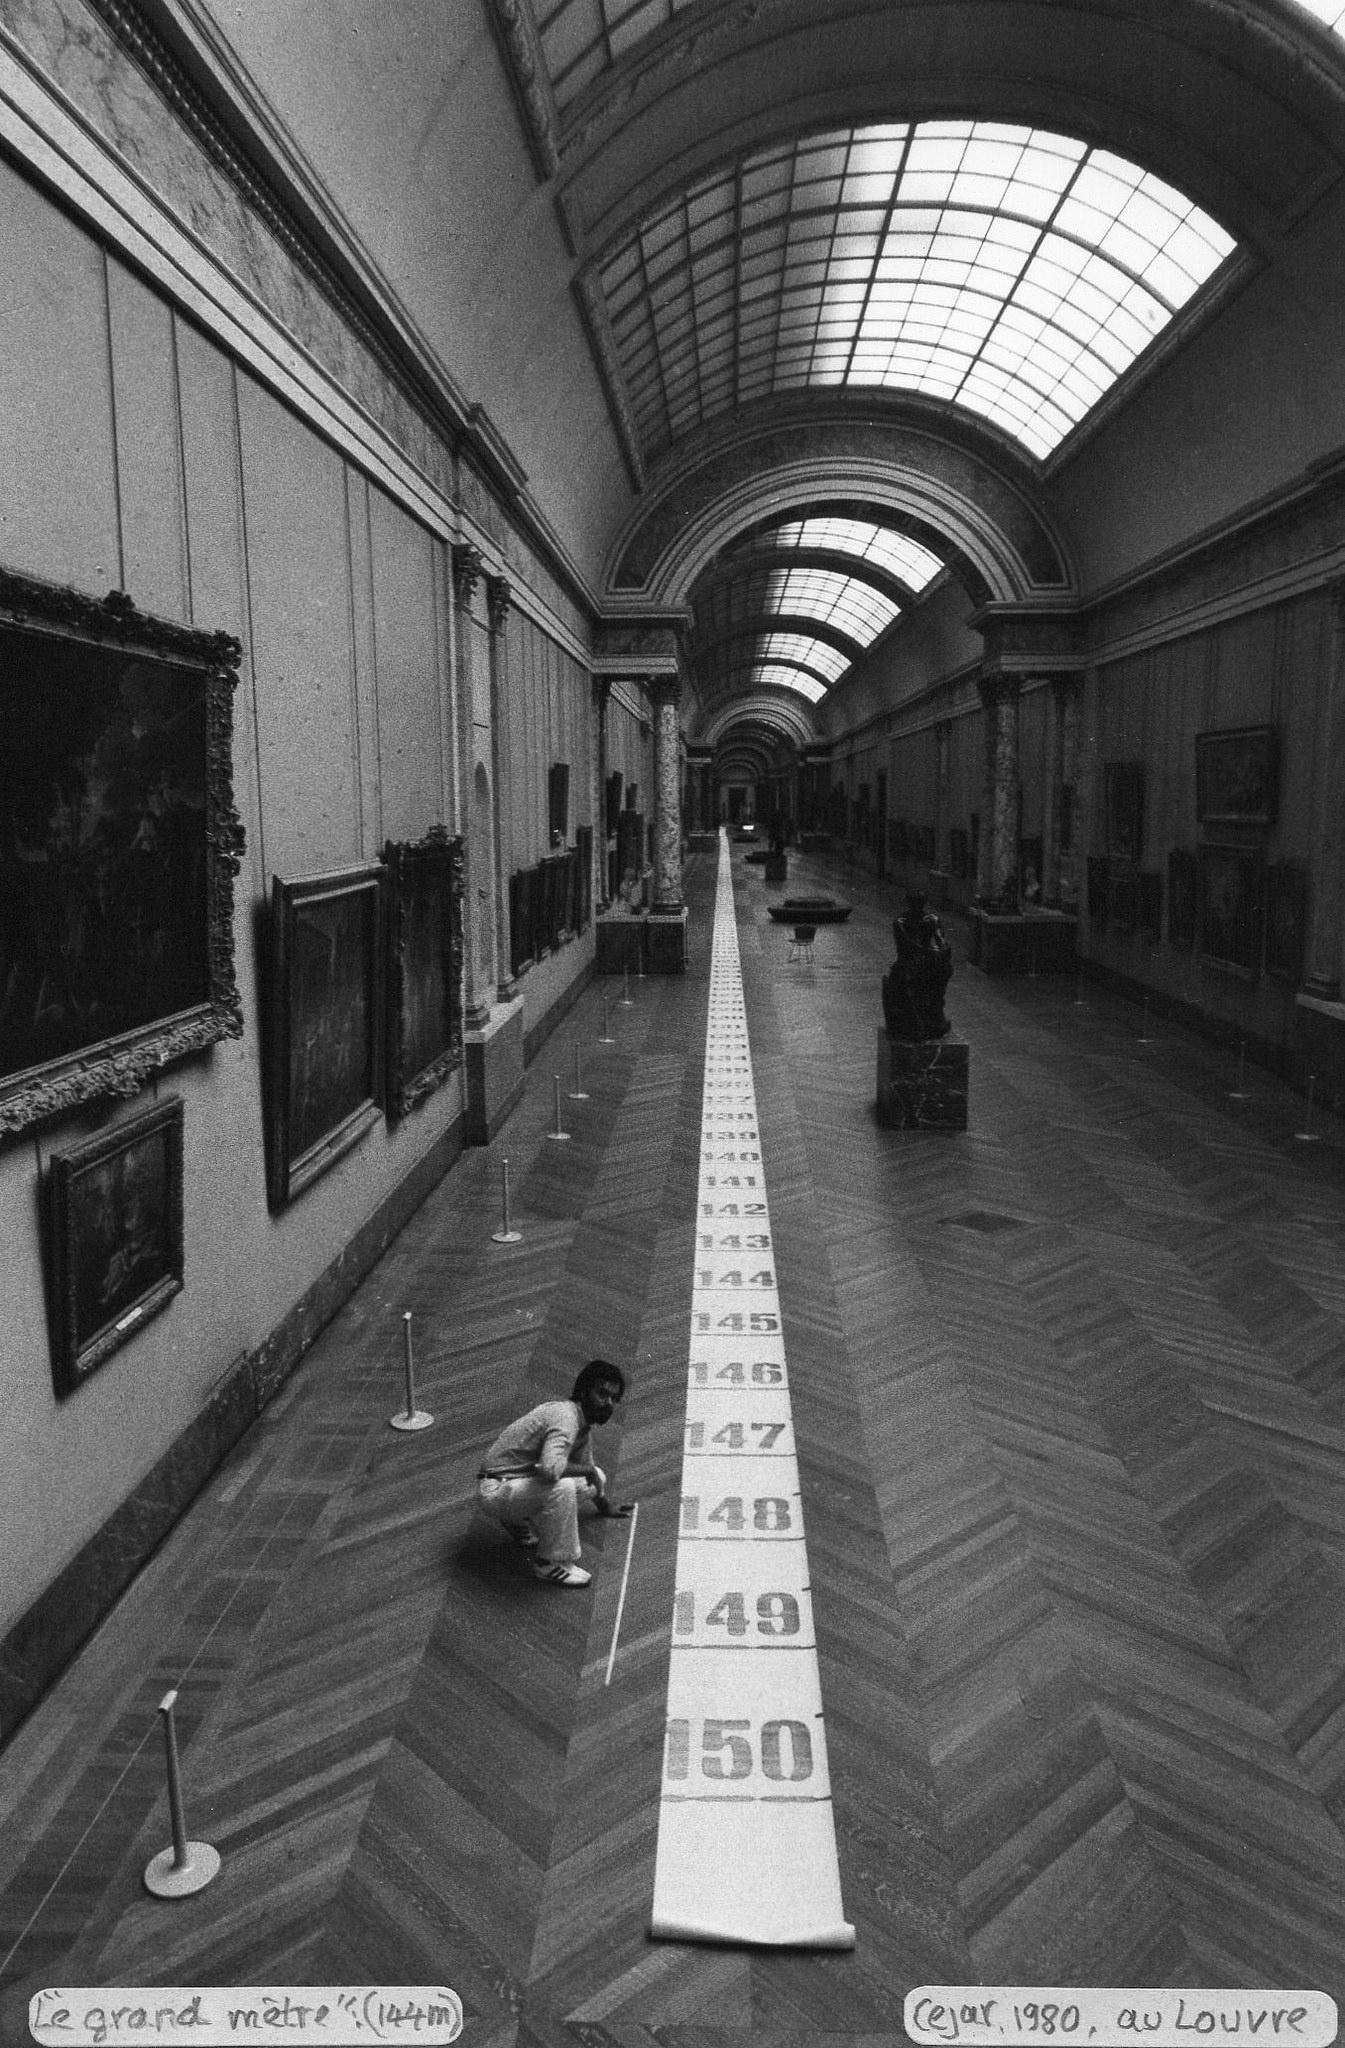 Céjar, 1980